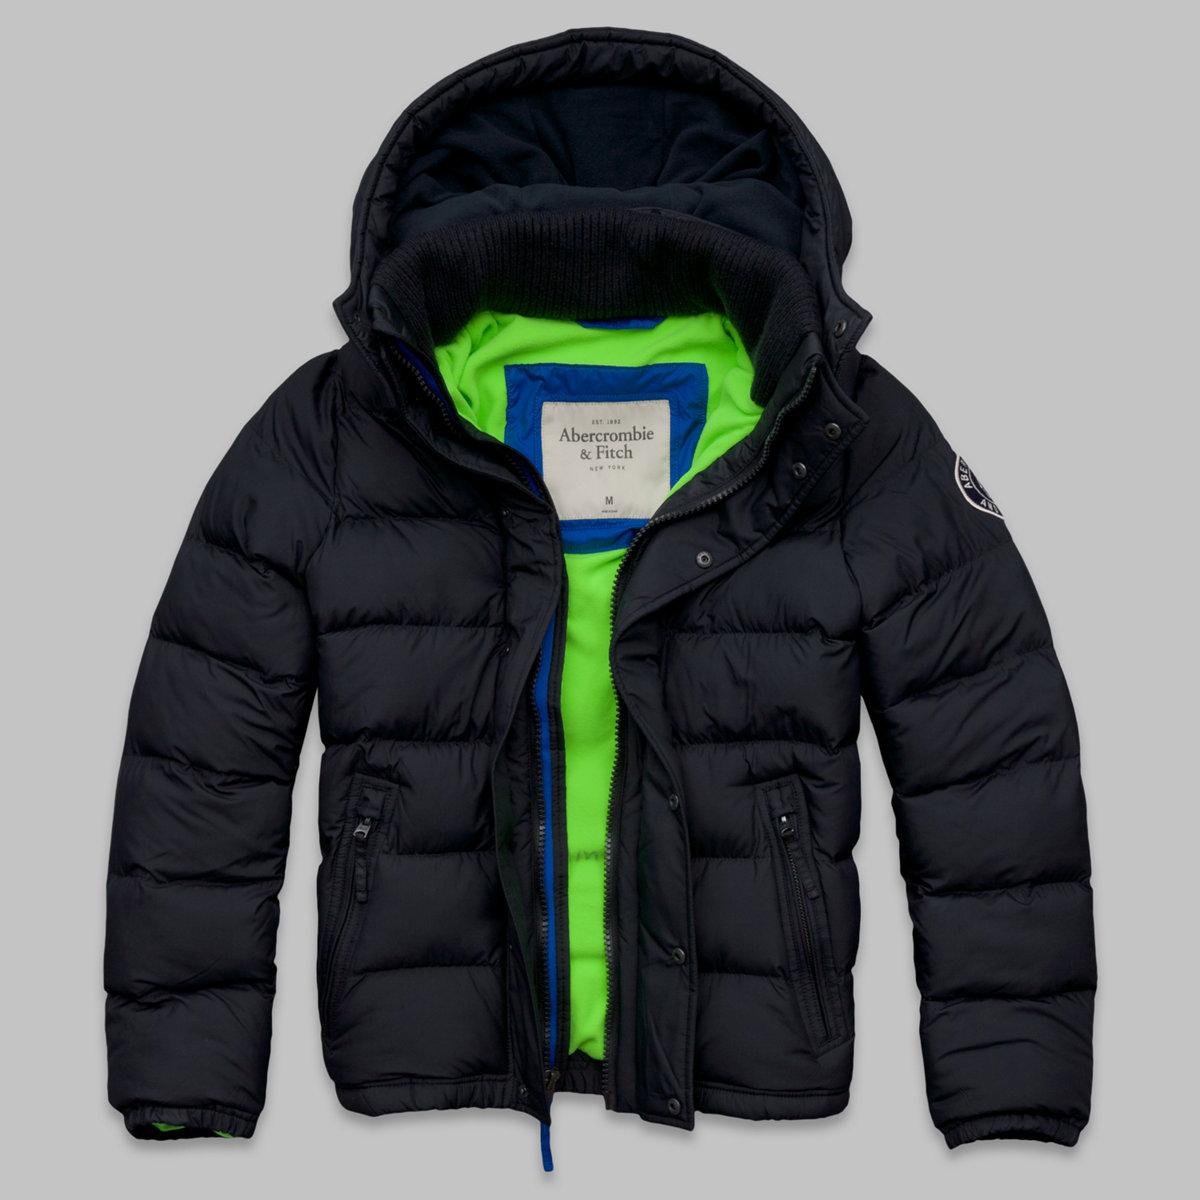 Ranney Trail Jacket